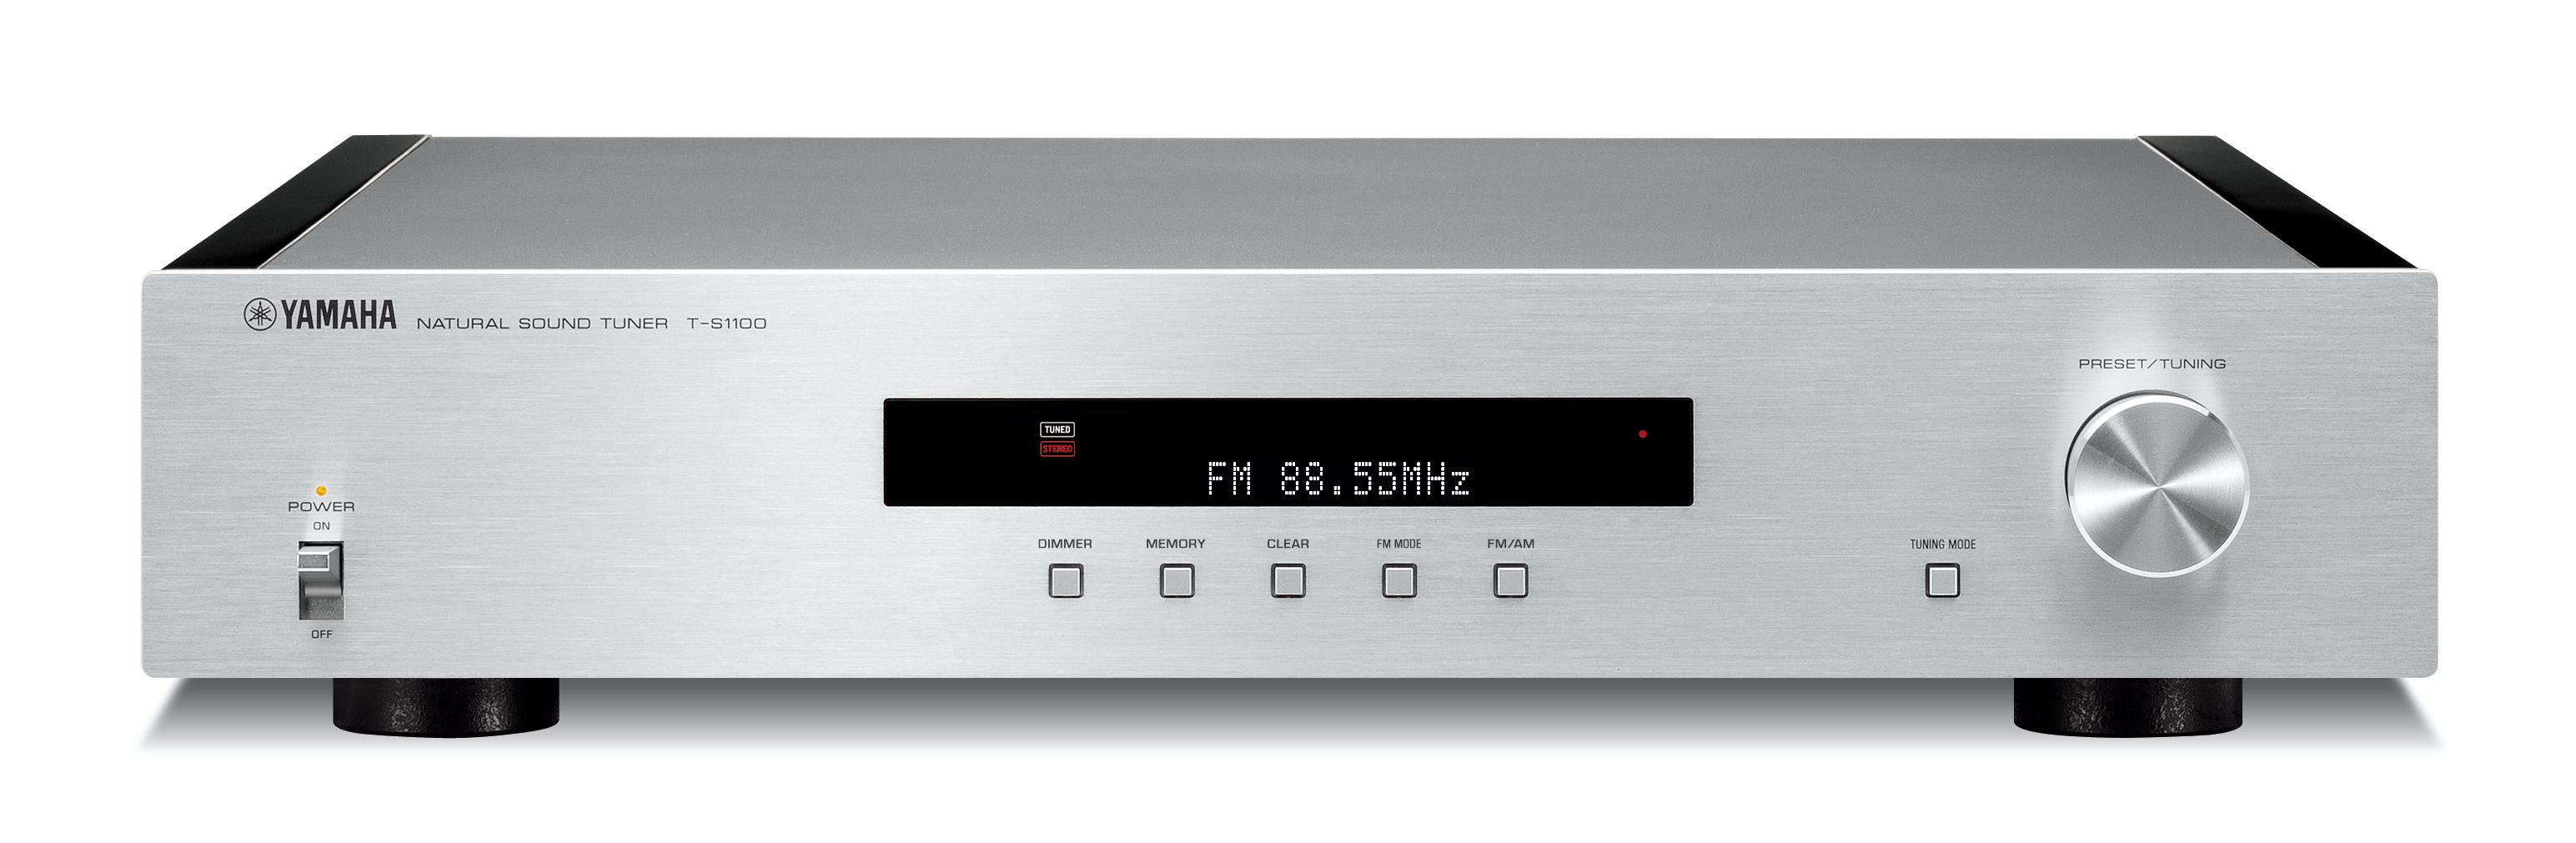 YAMAHA   T-S1100(AM/FMチューナー)(2015年11月下旬 新発売) ※ 販売終了しました。